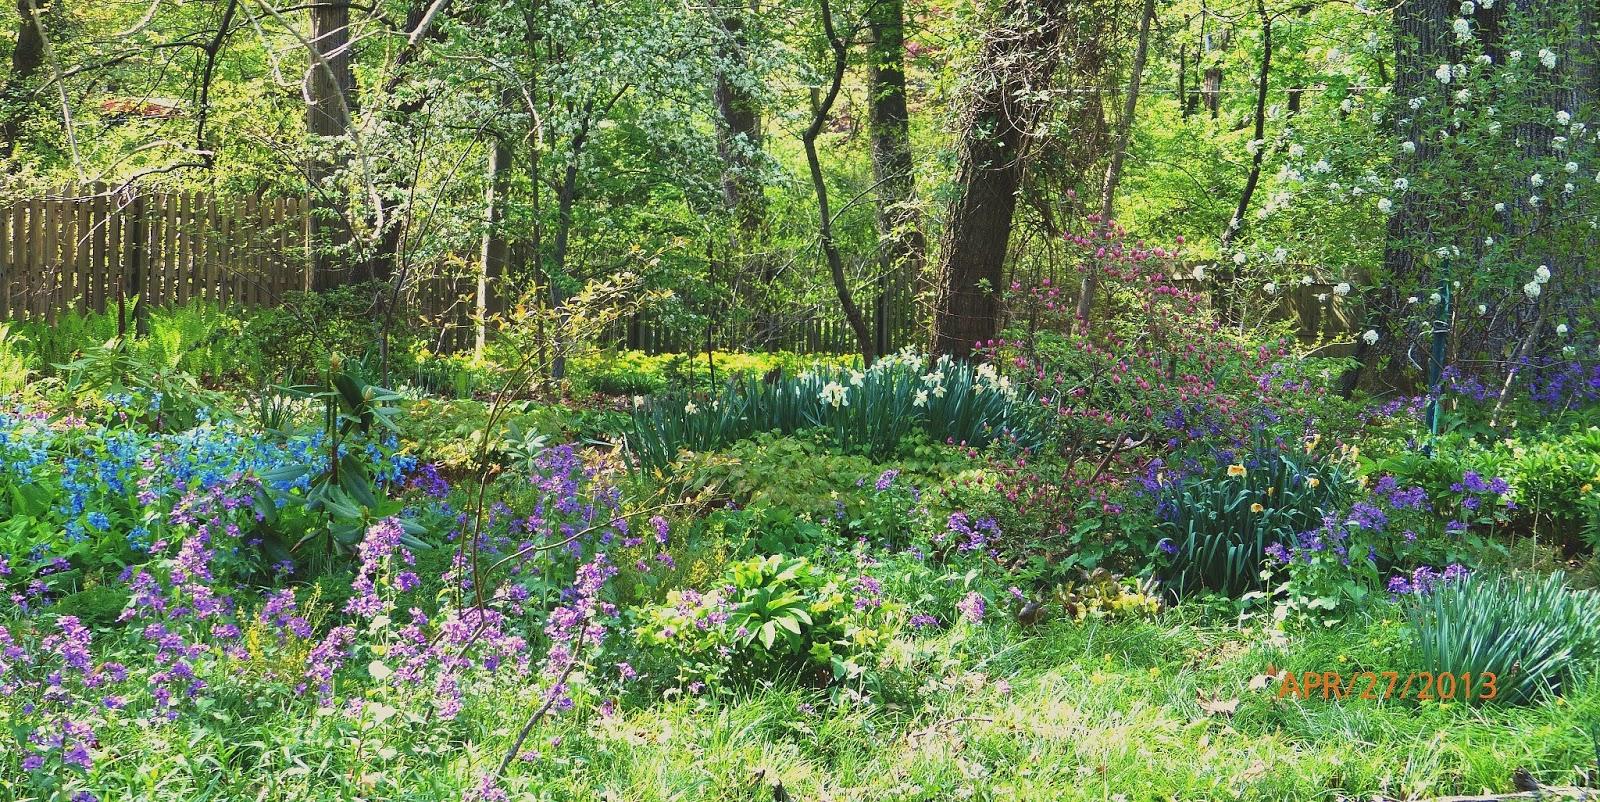 Wissahickon Schist The Perfectly Imperfect Woodland Garden – Woodland Garden Plants